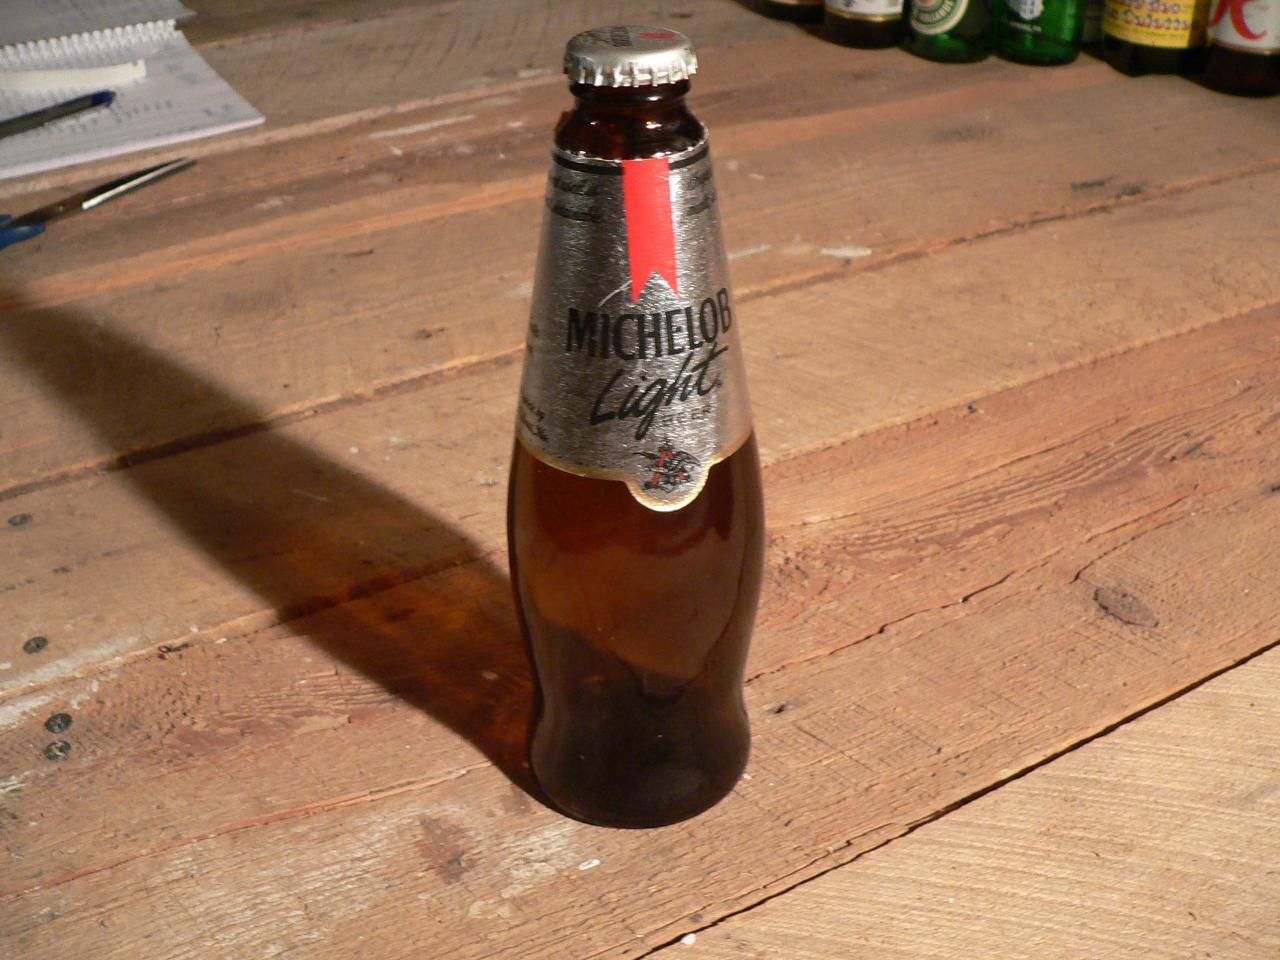 Biere michelob light # 4739.39